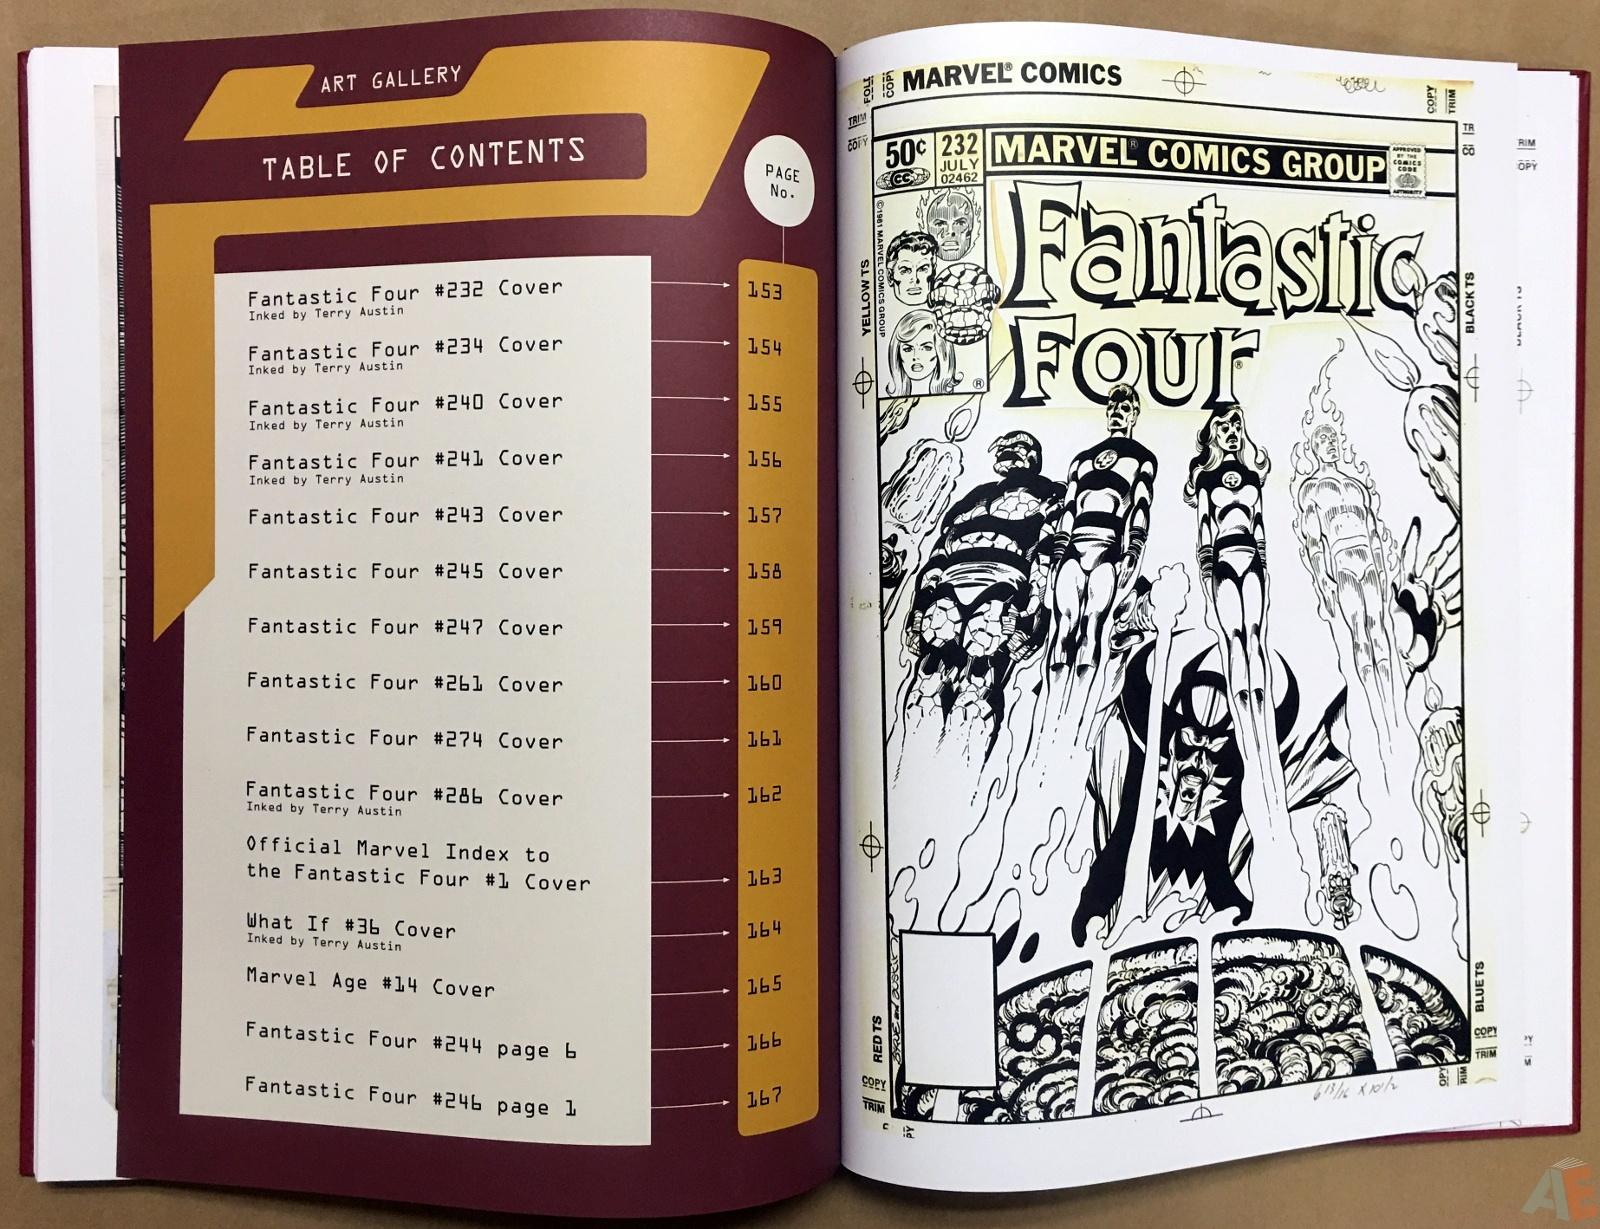 John Byrne's The Fantastic Four Artist's Edition 52